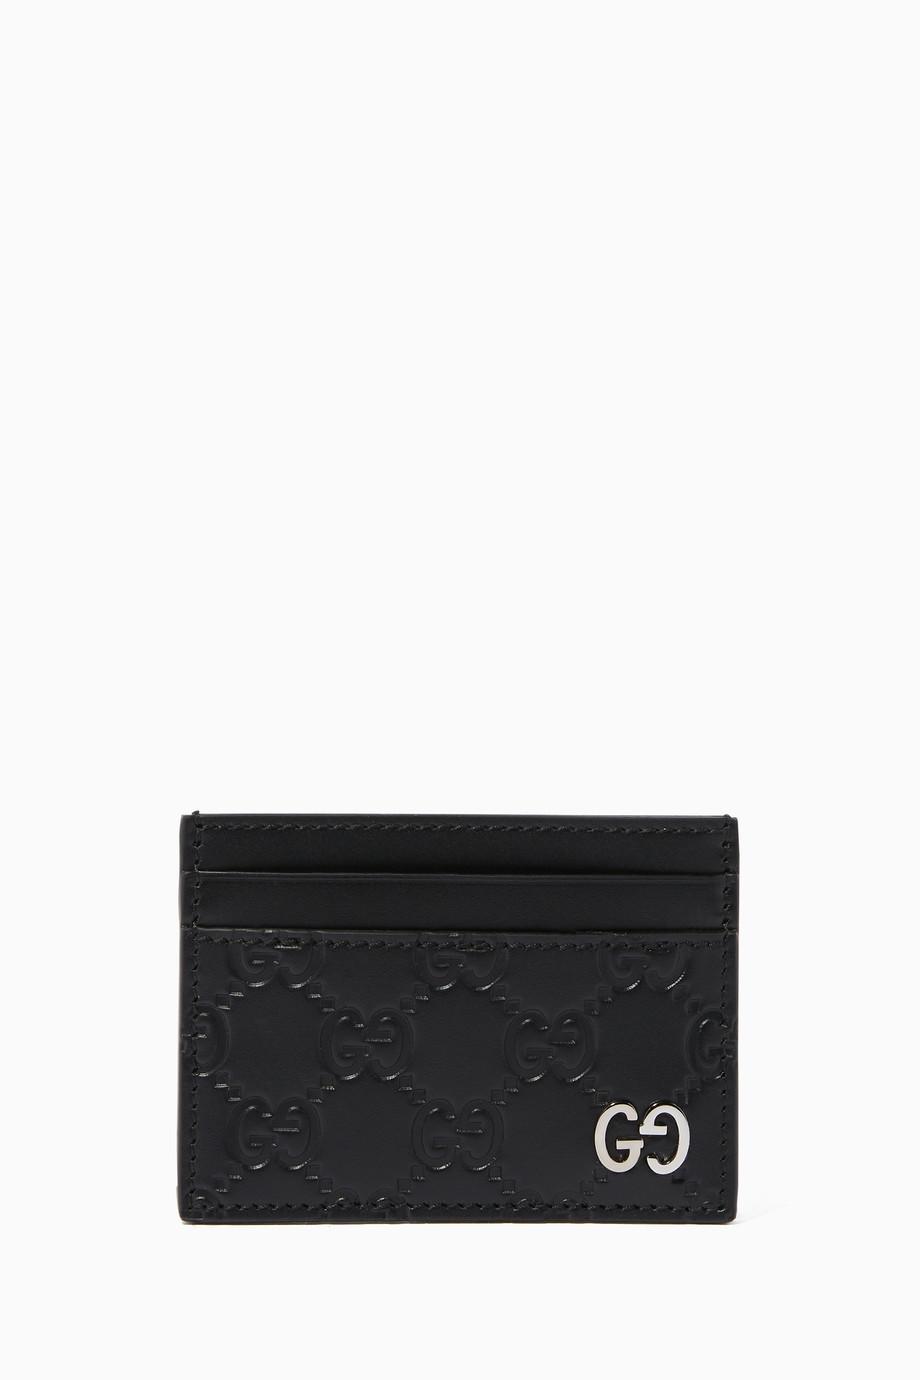 card holder wallet mens gucci